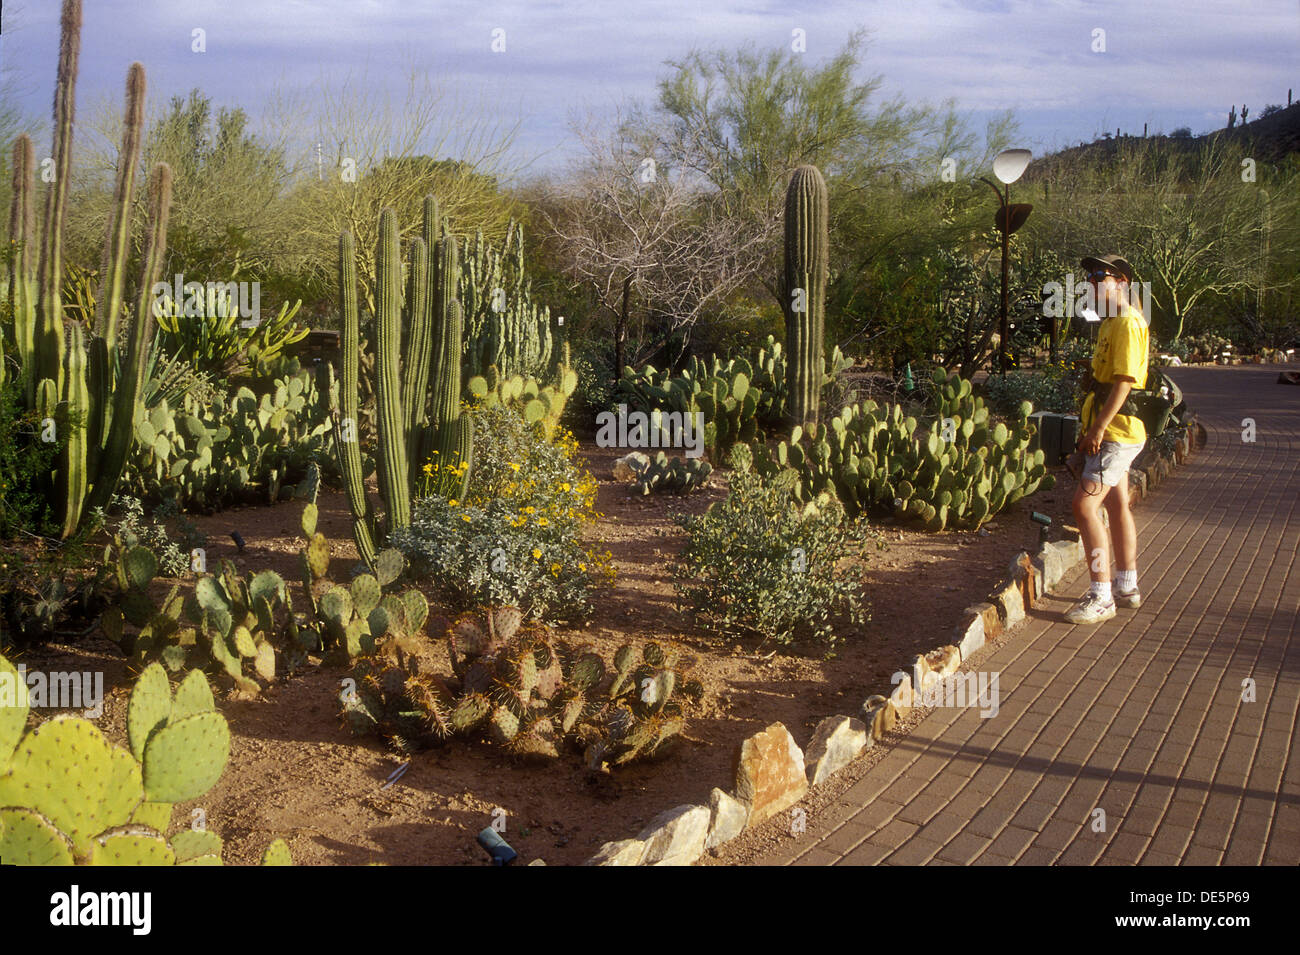 Charmant Cactus Garden, Desert Botanical Garden, Papago Park, Phoenix, Arizona, USA